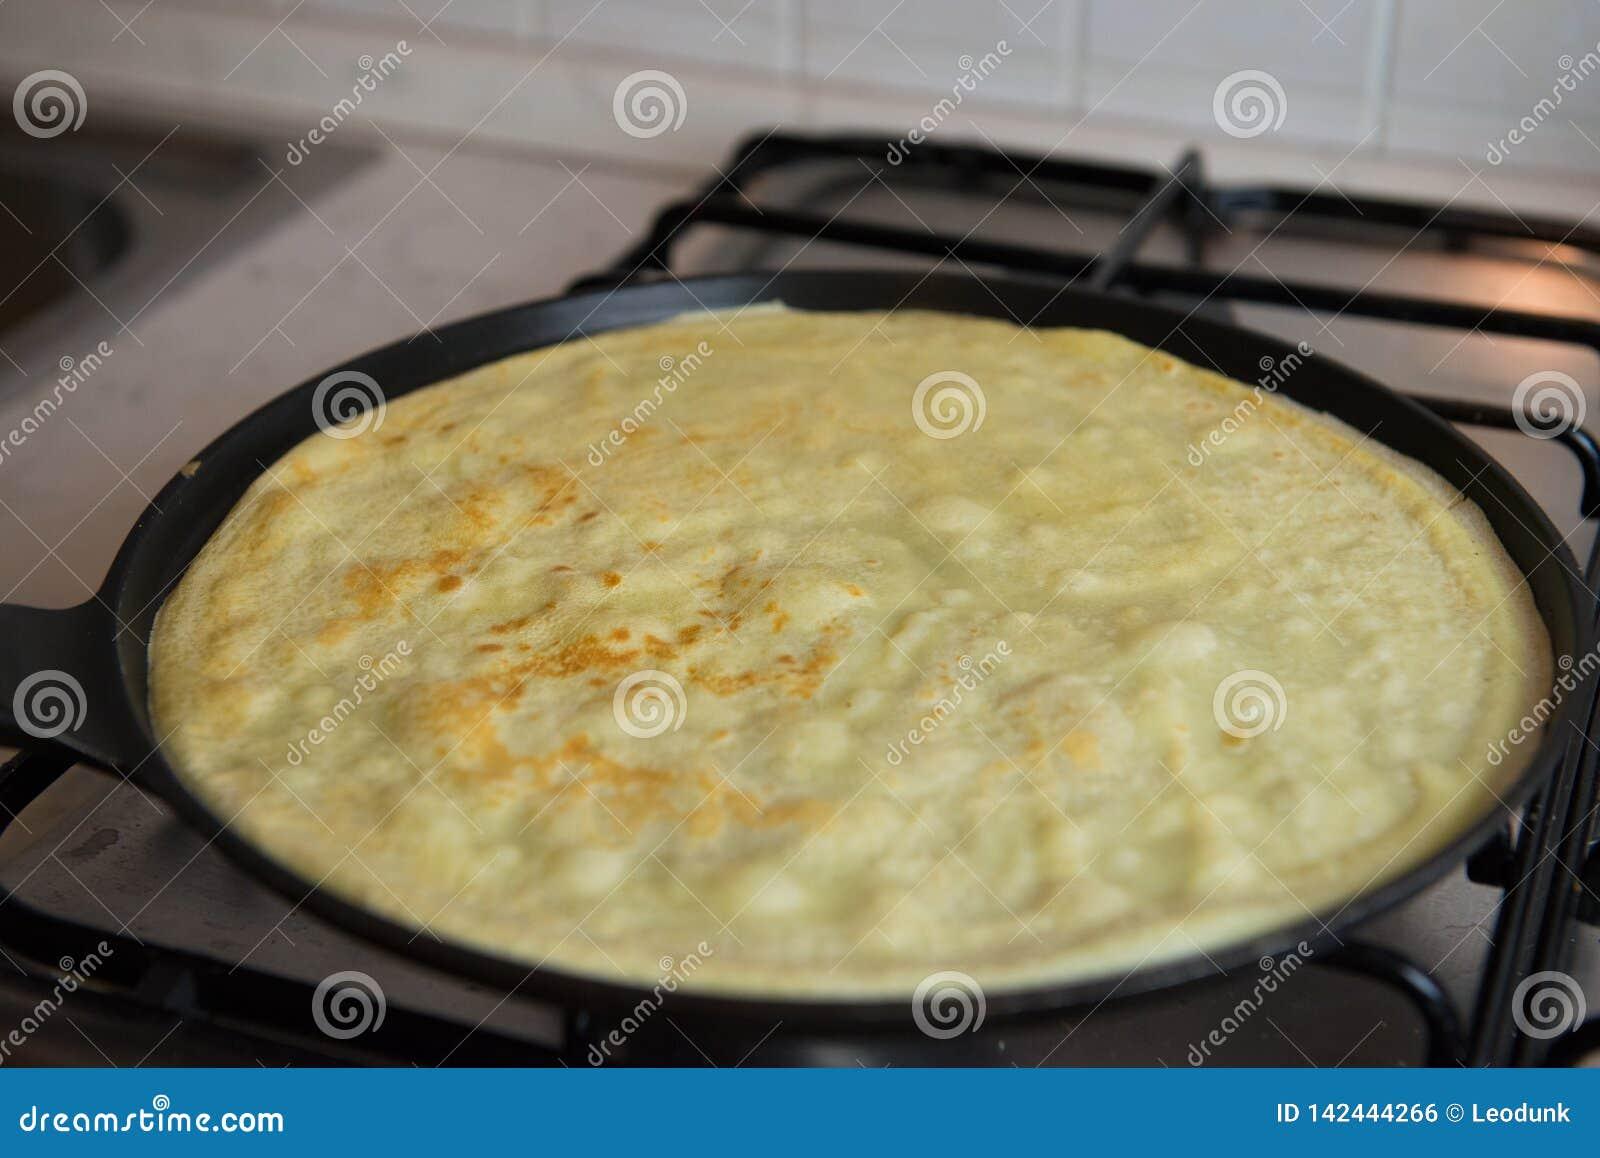 Preparing fresh homemade thin crepes pancakes